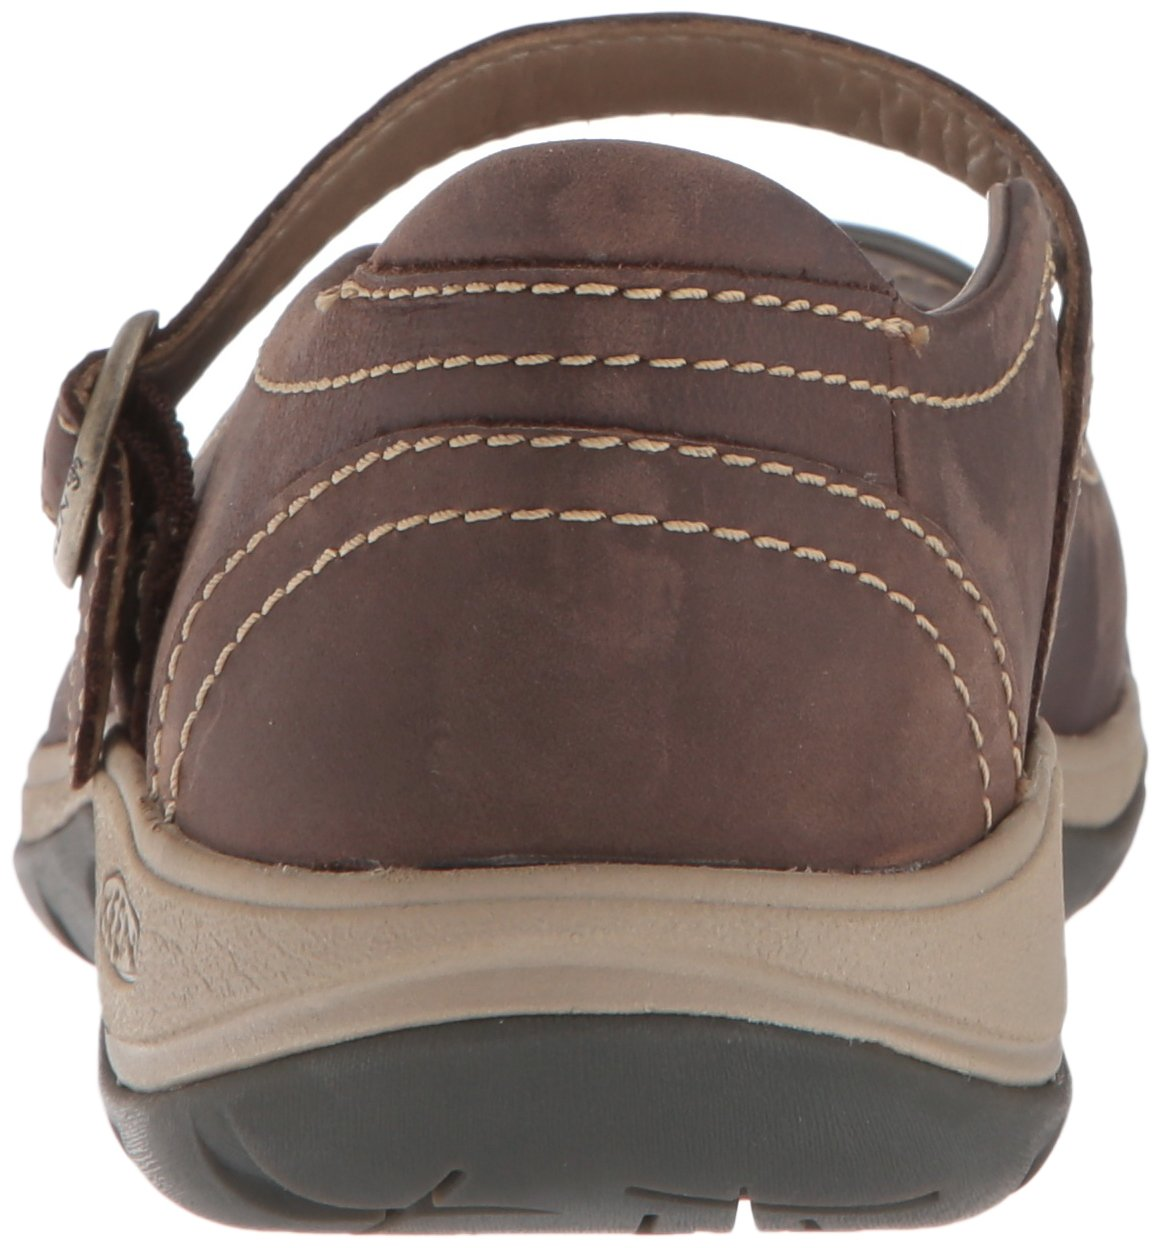 KEEN Women's Presidio II MJ-W Hiking Shoe, Infield/Cornstalk, 8.5 M US 2